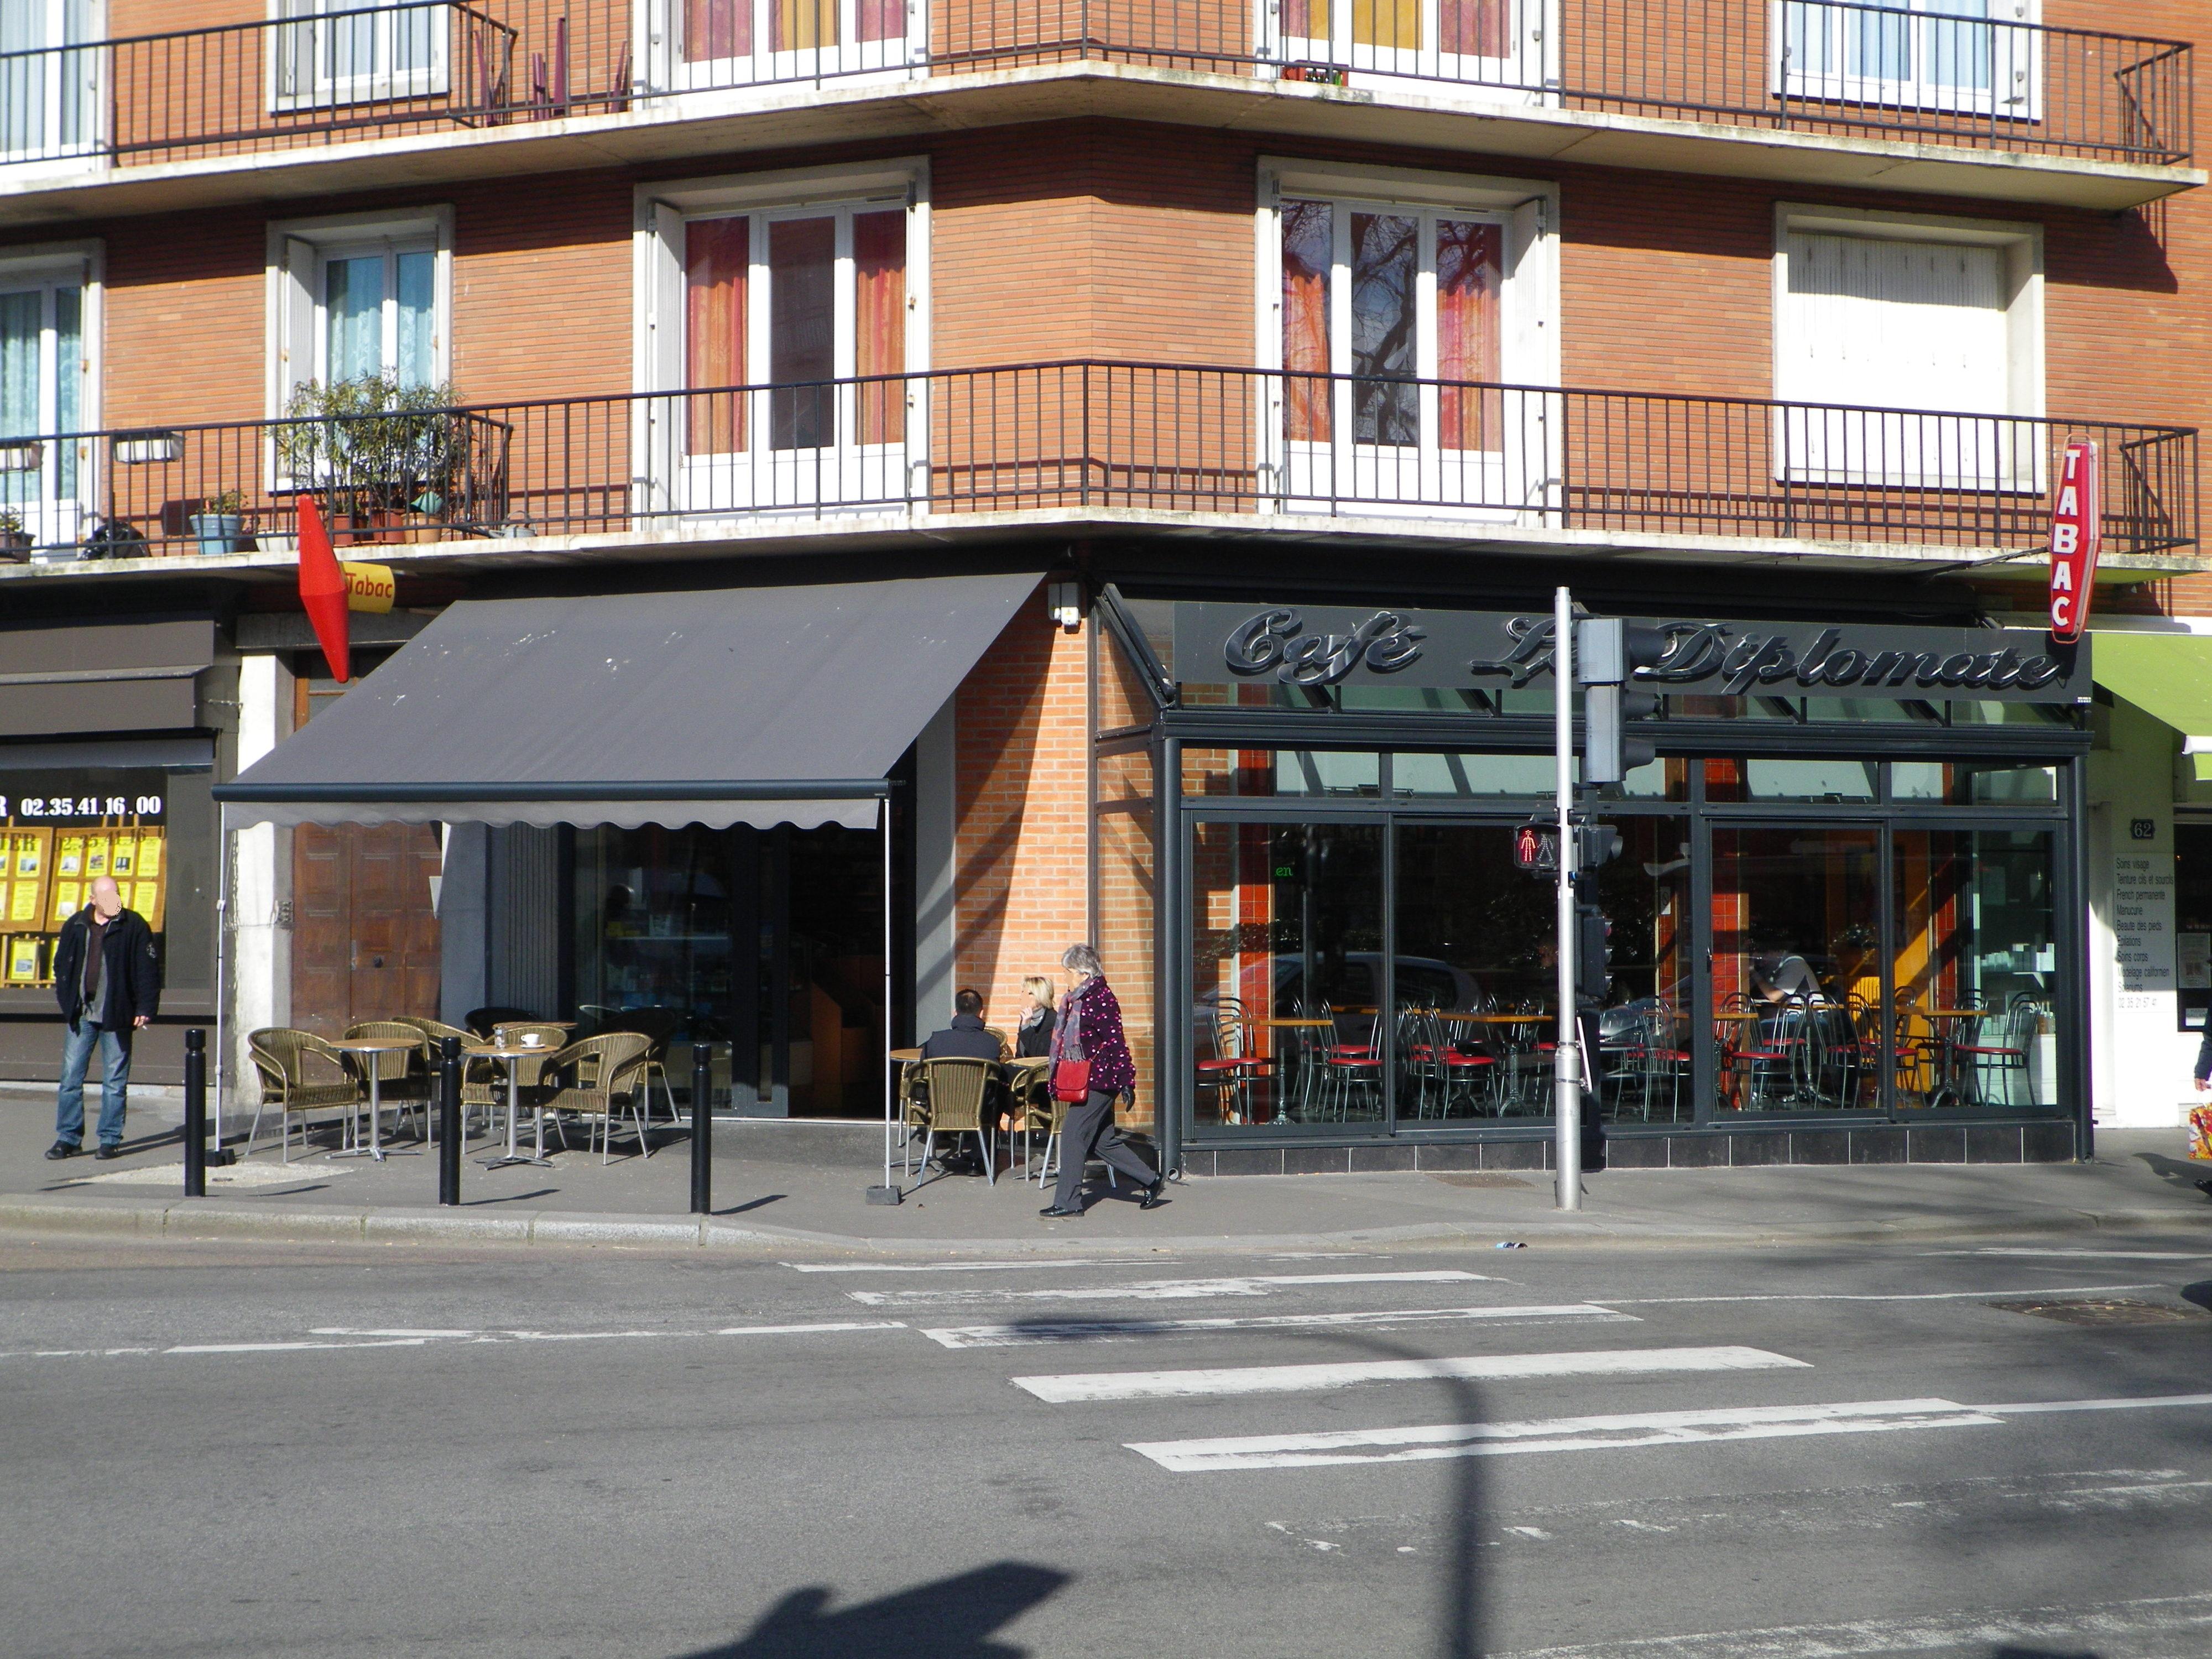 Bar le Diplomate Le Havre